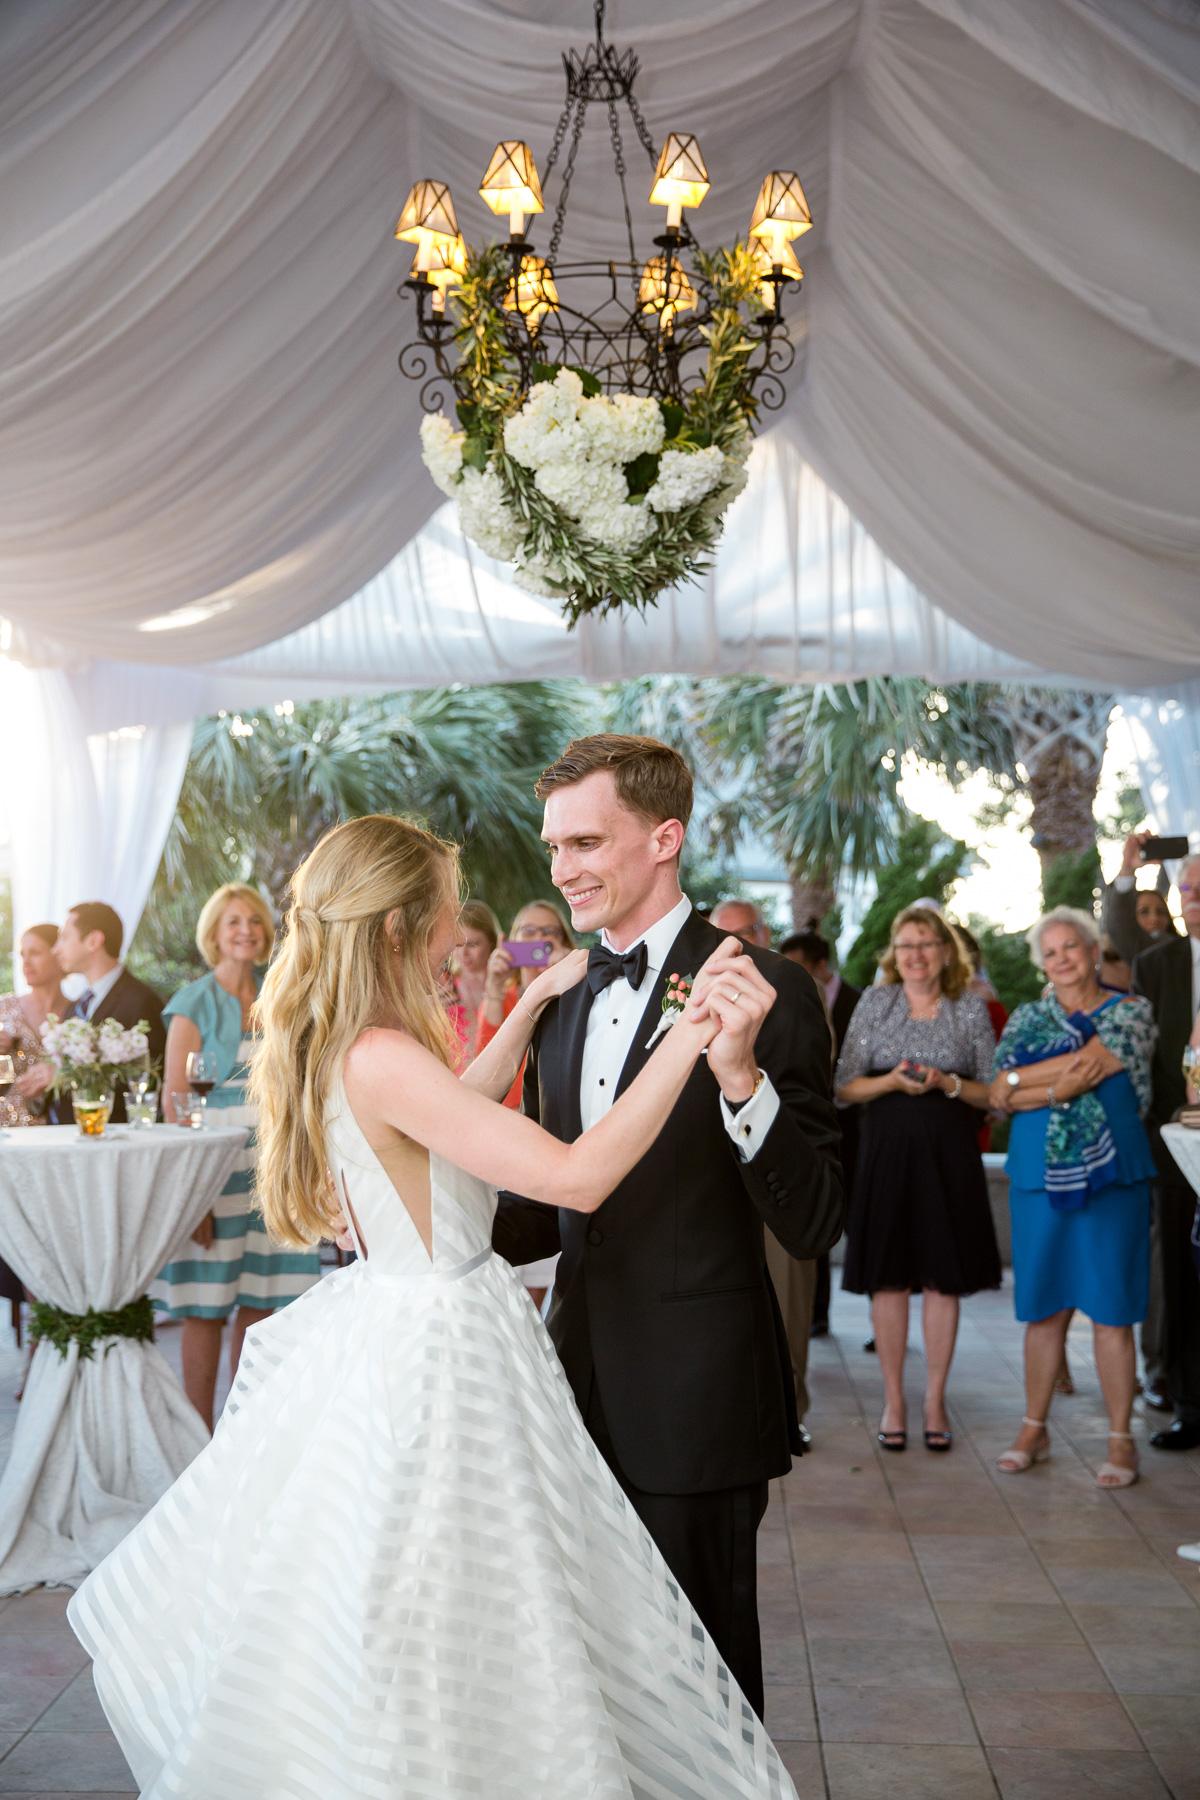 NC-wedding-photographer-best-01.jpg